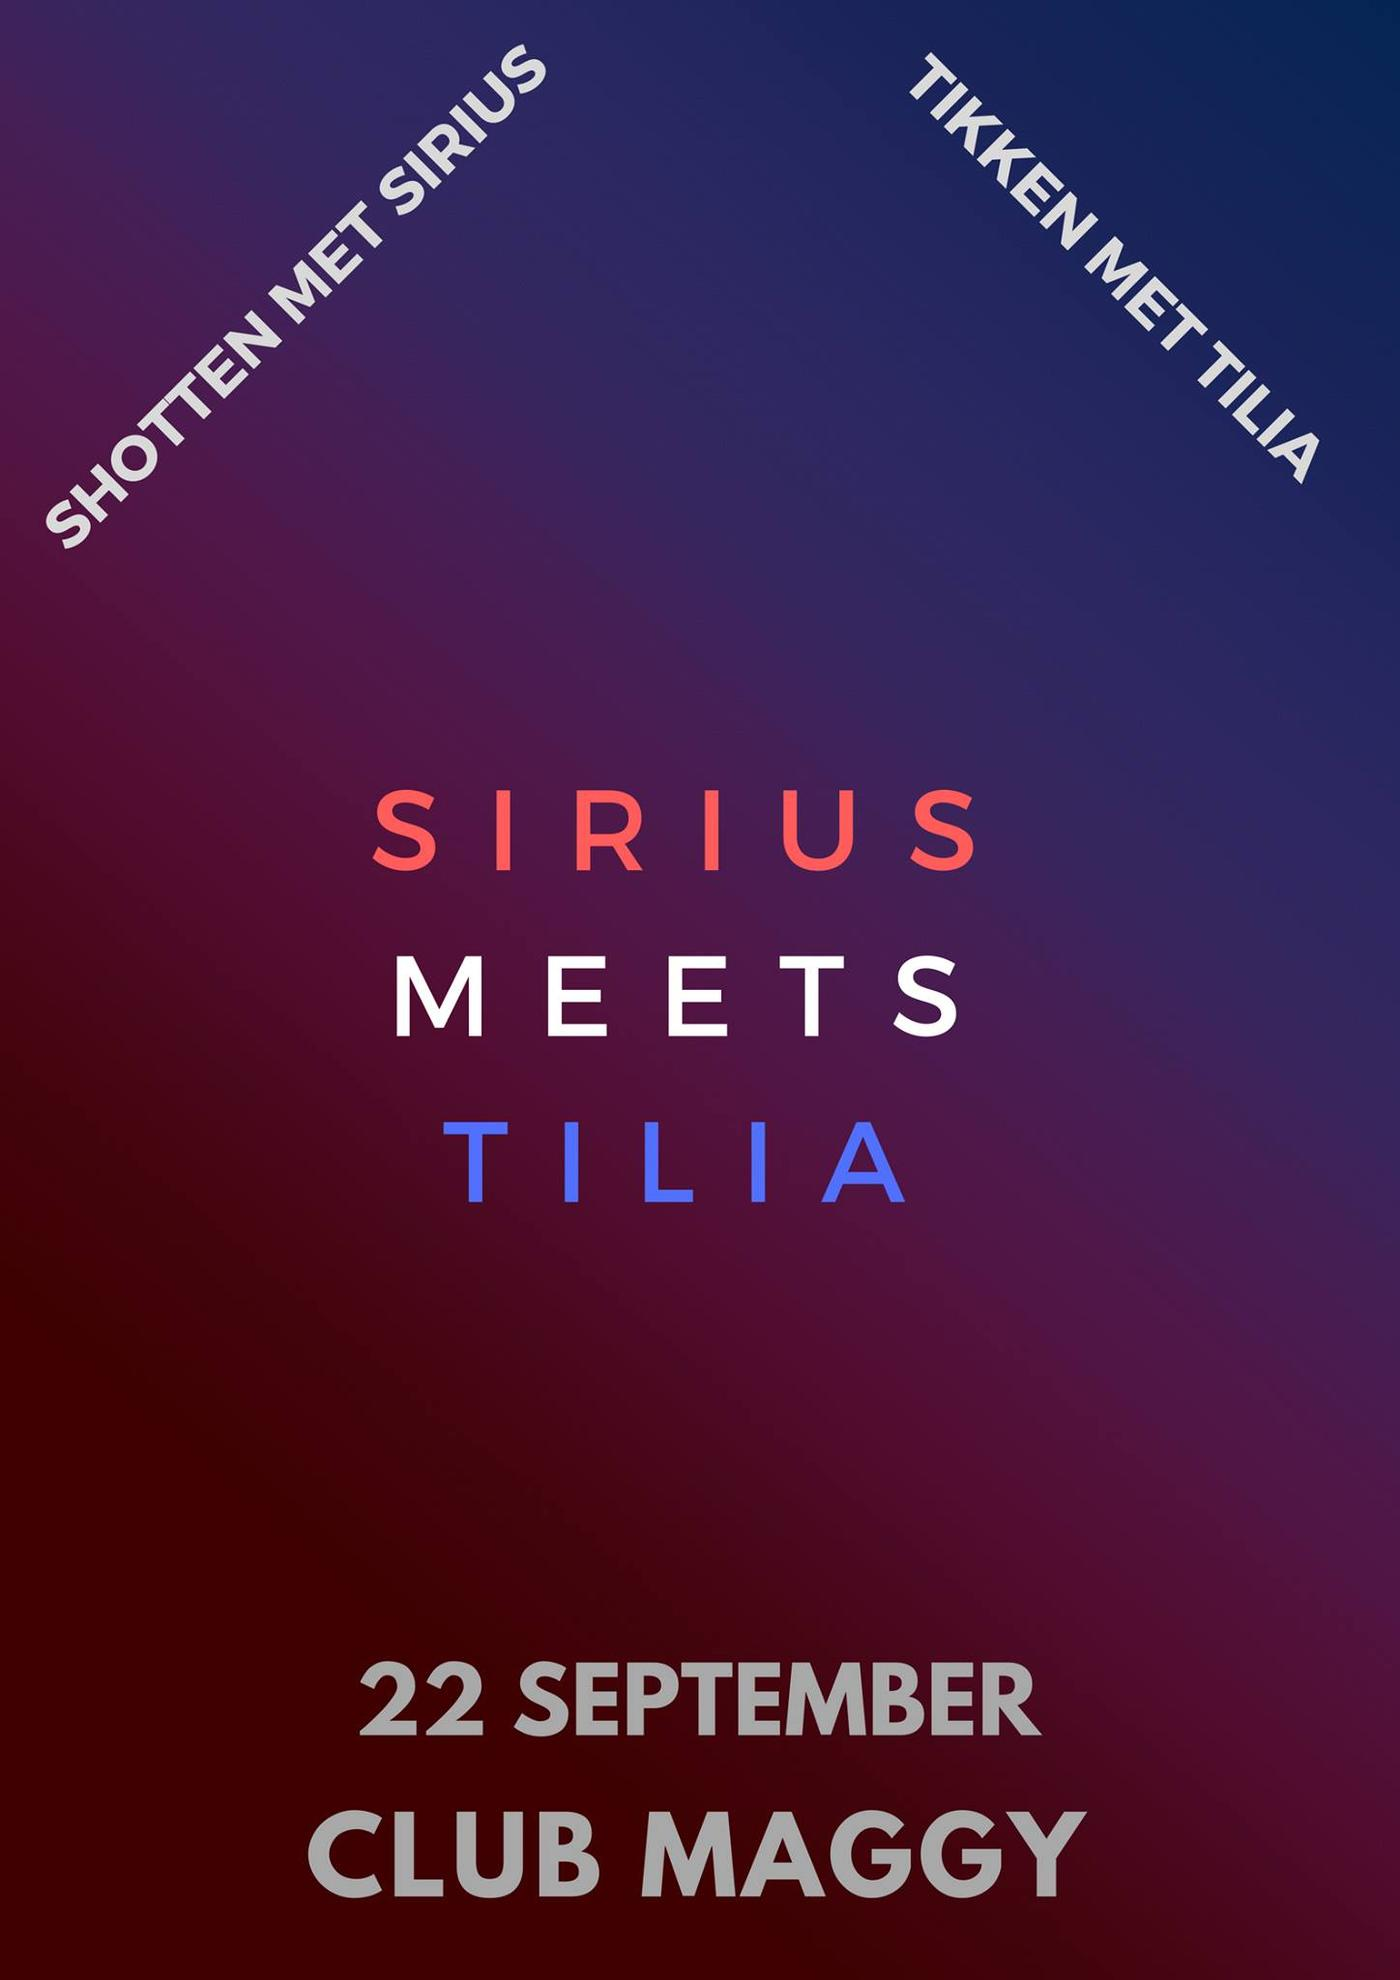 Sirius meets Tilia